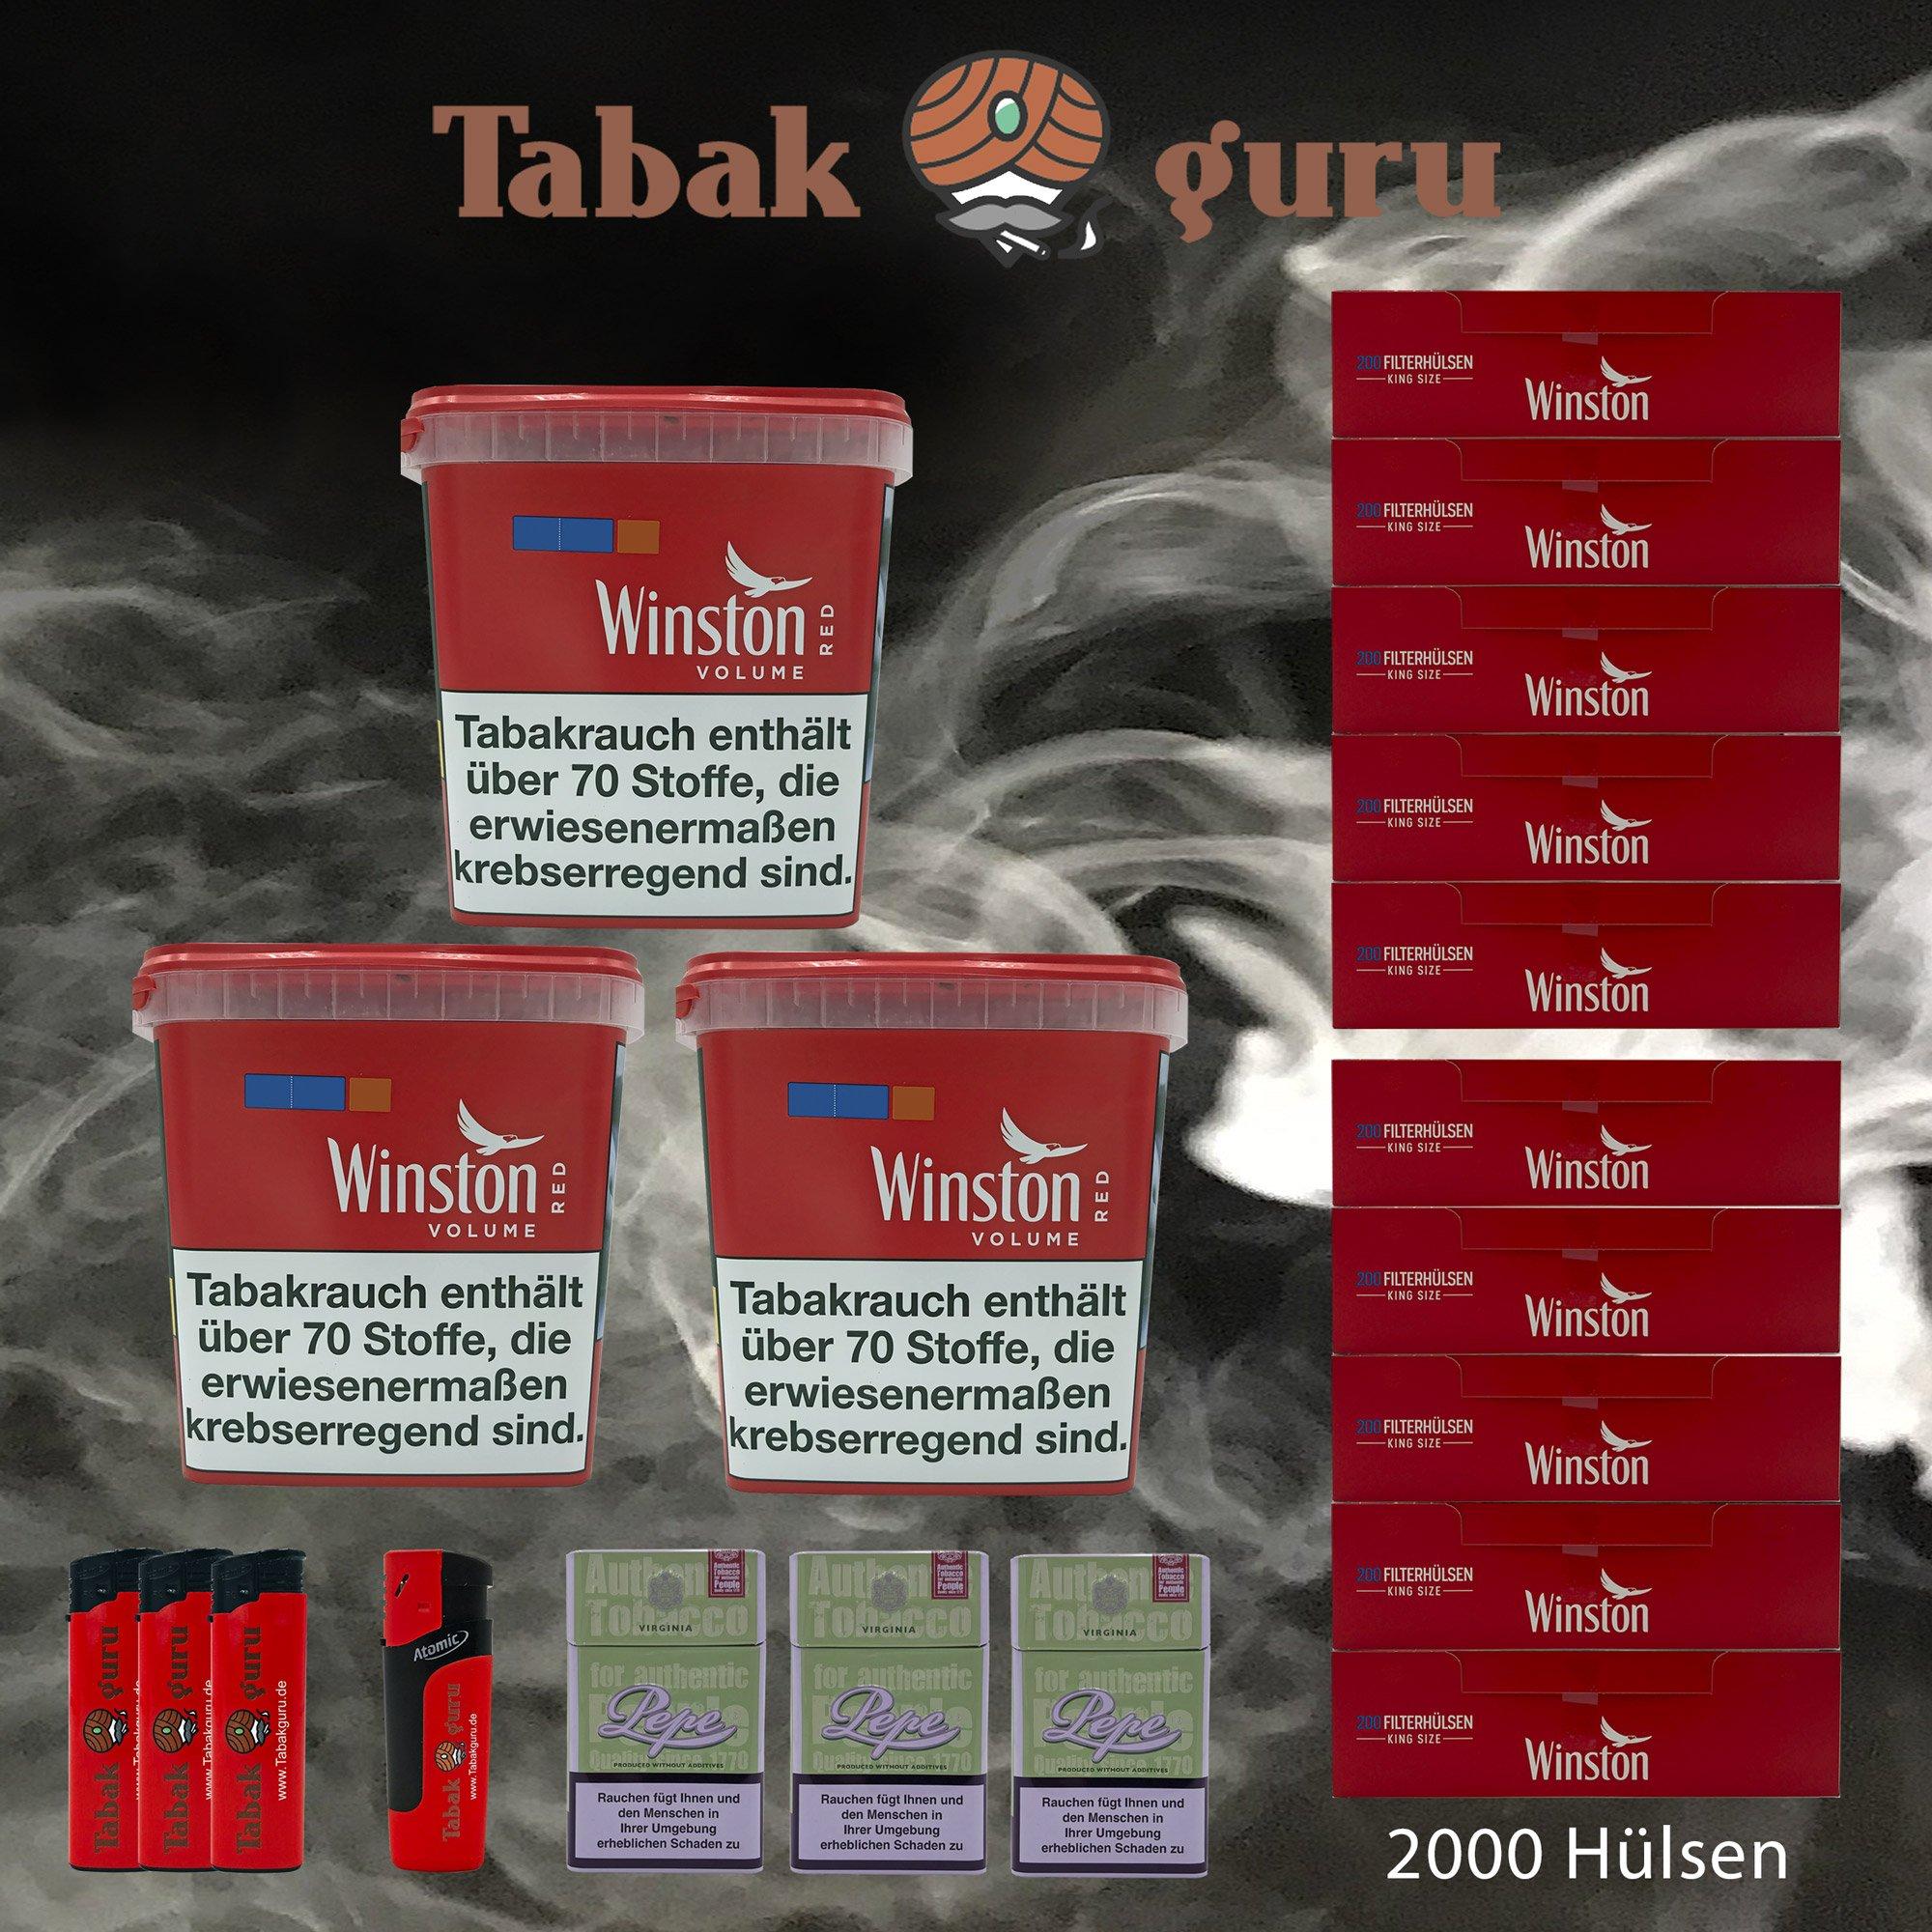 3x Winston Classic Red/Rot Giant Box 280g Volumentabak, 2000 Hülsen, Zubehör